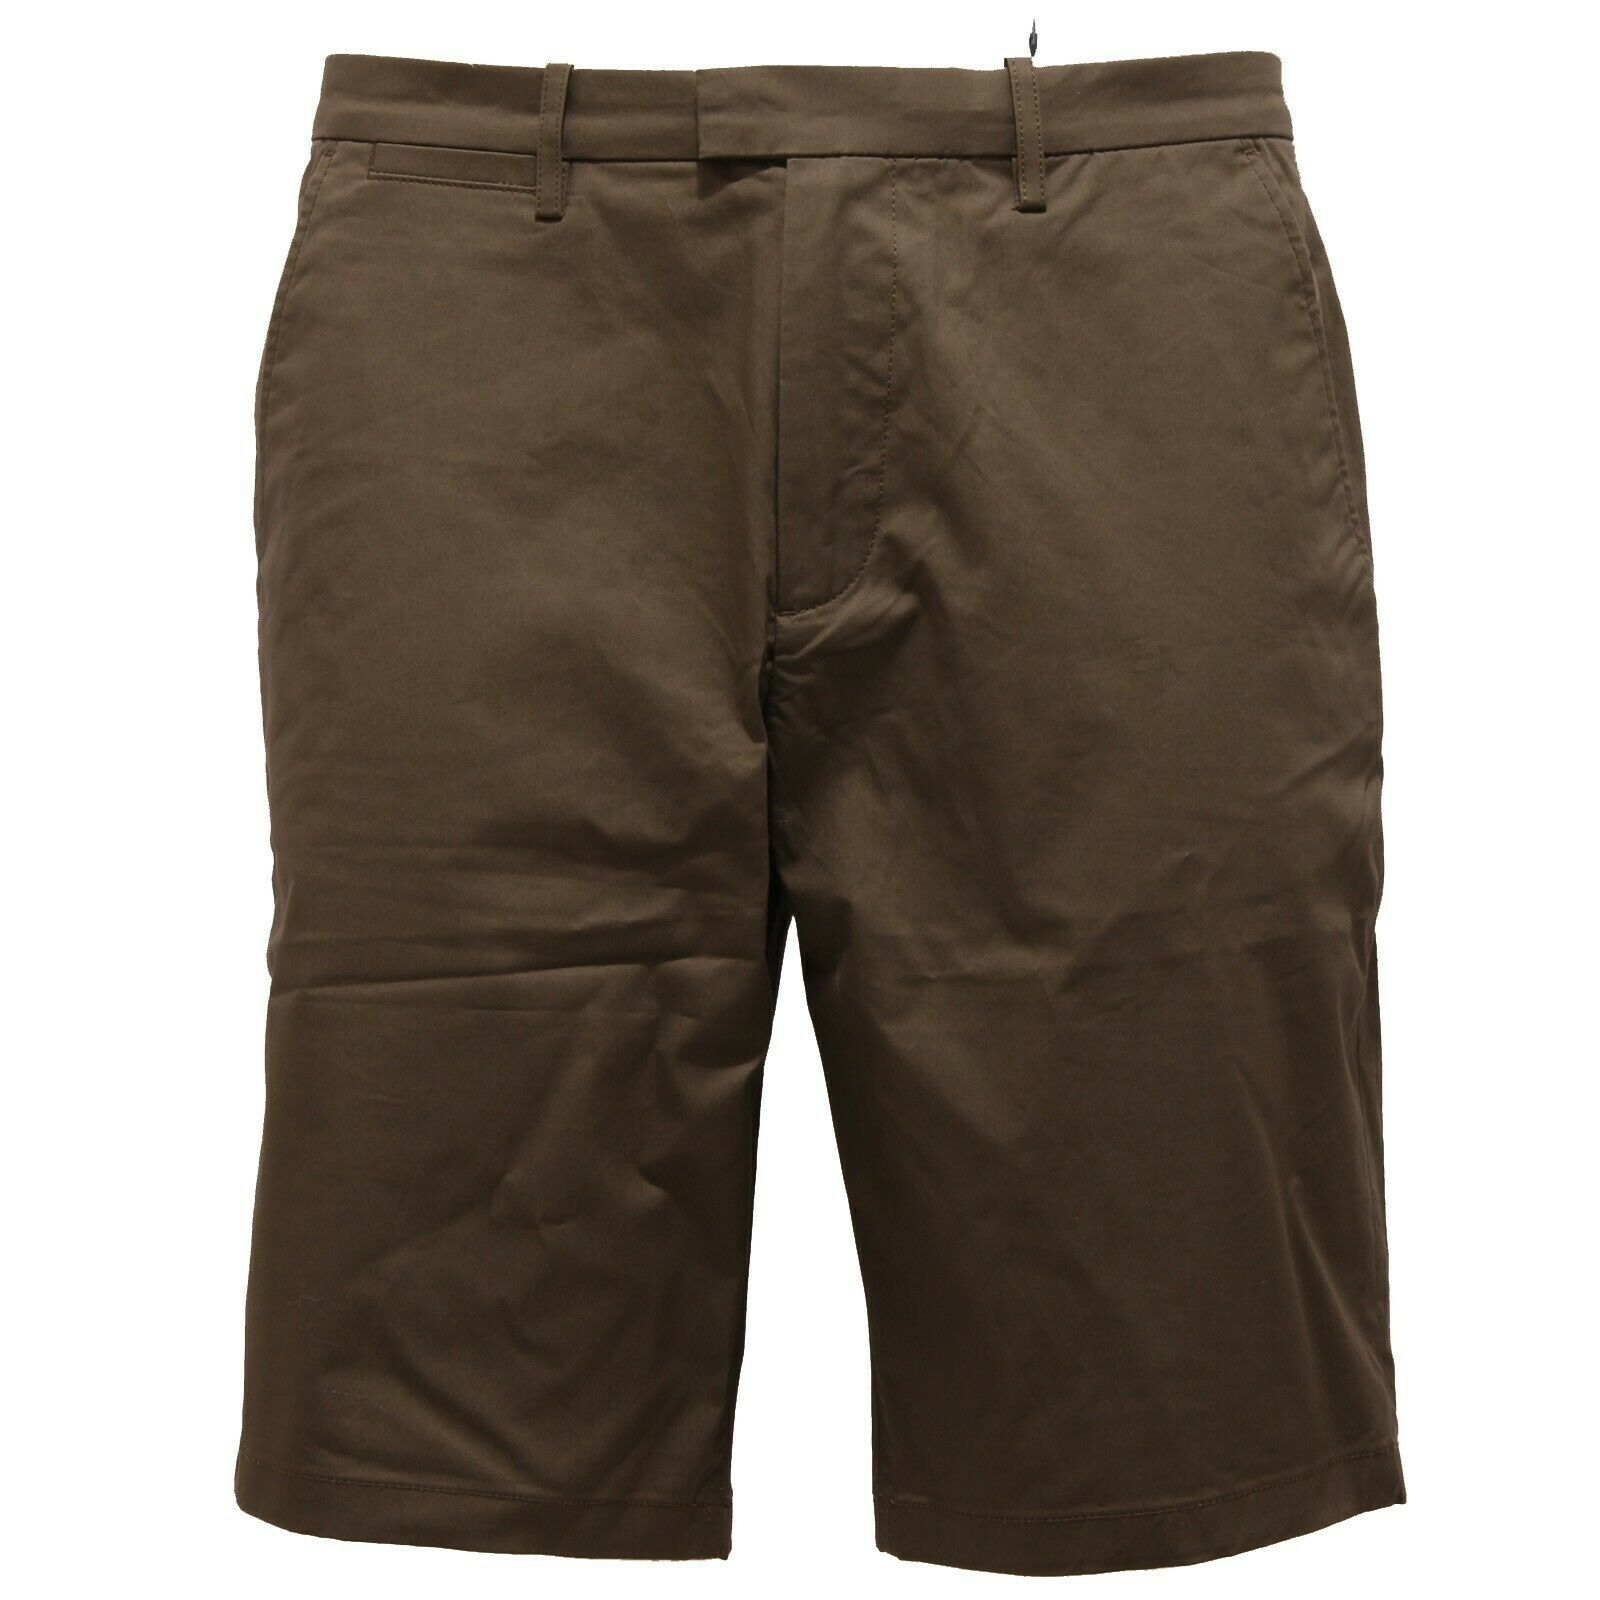 0750Z bermuda uomo FRED PERRY cotton Marronee pantalone corto shorts man